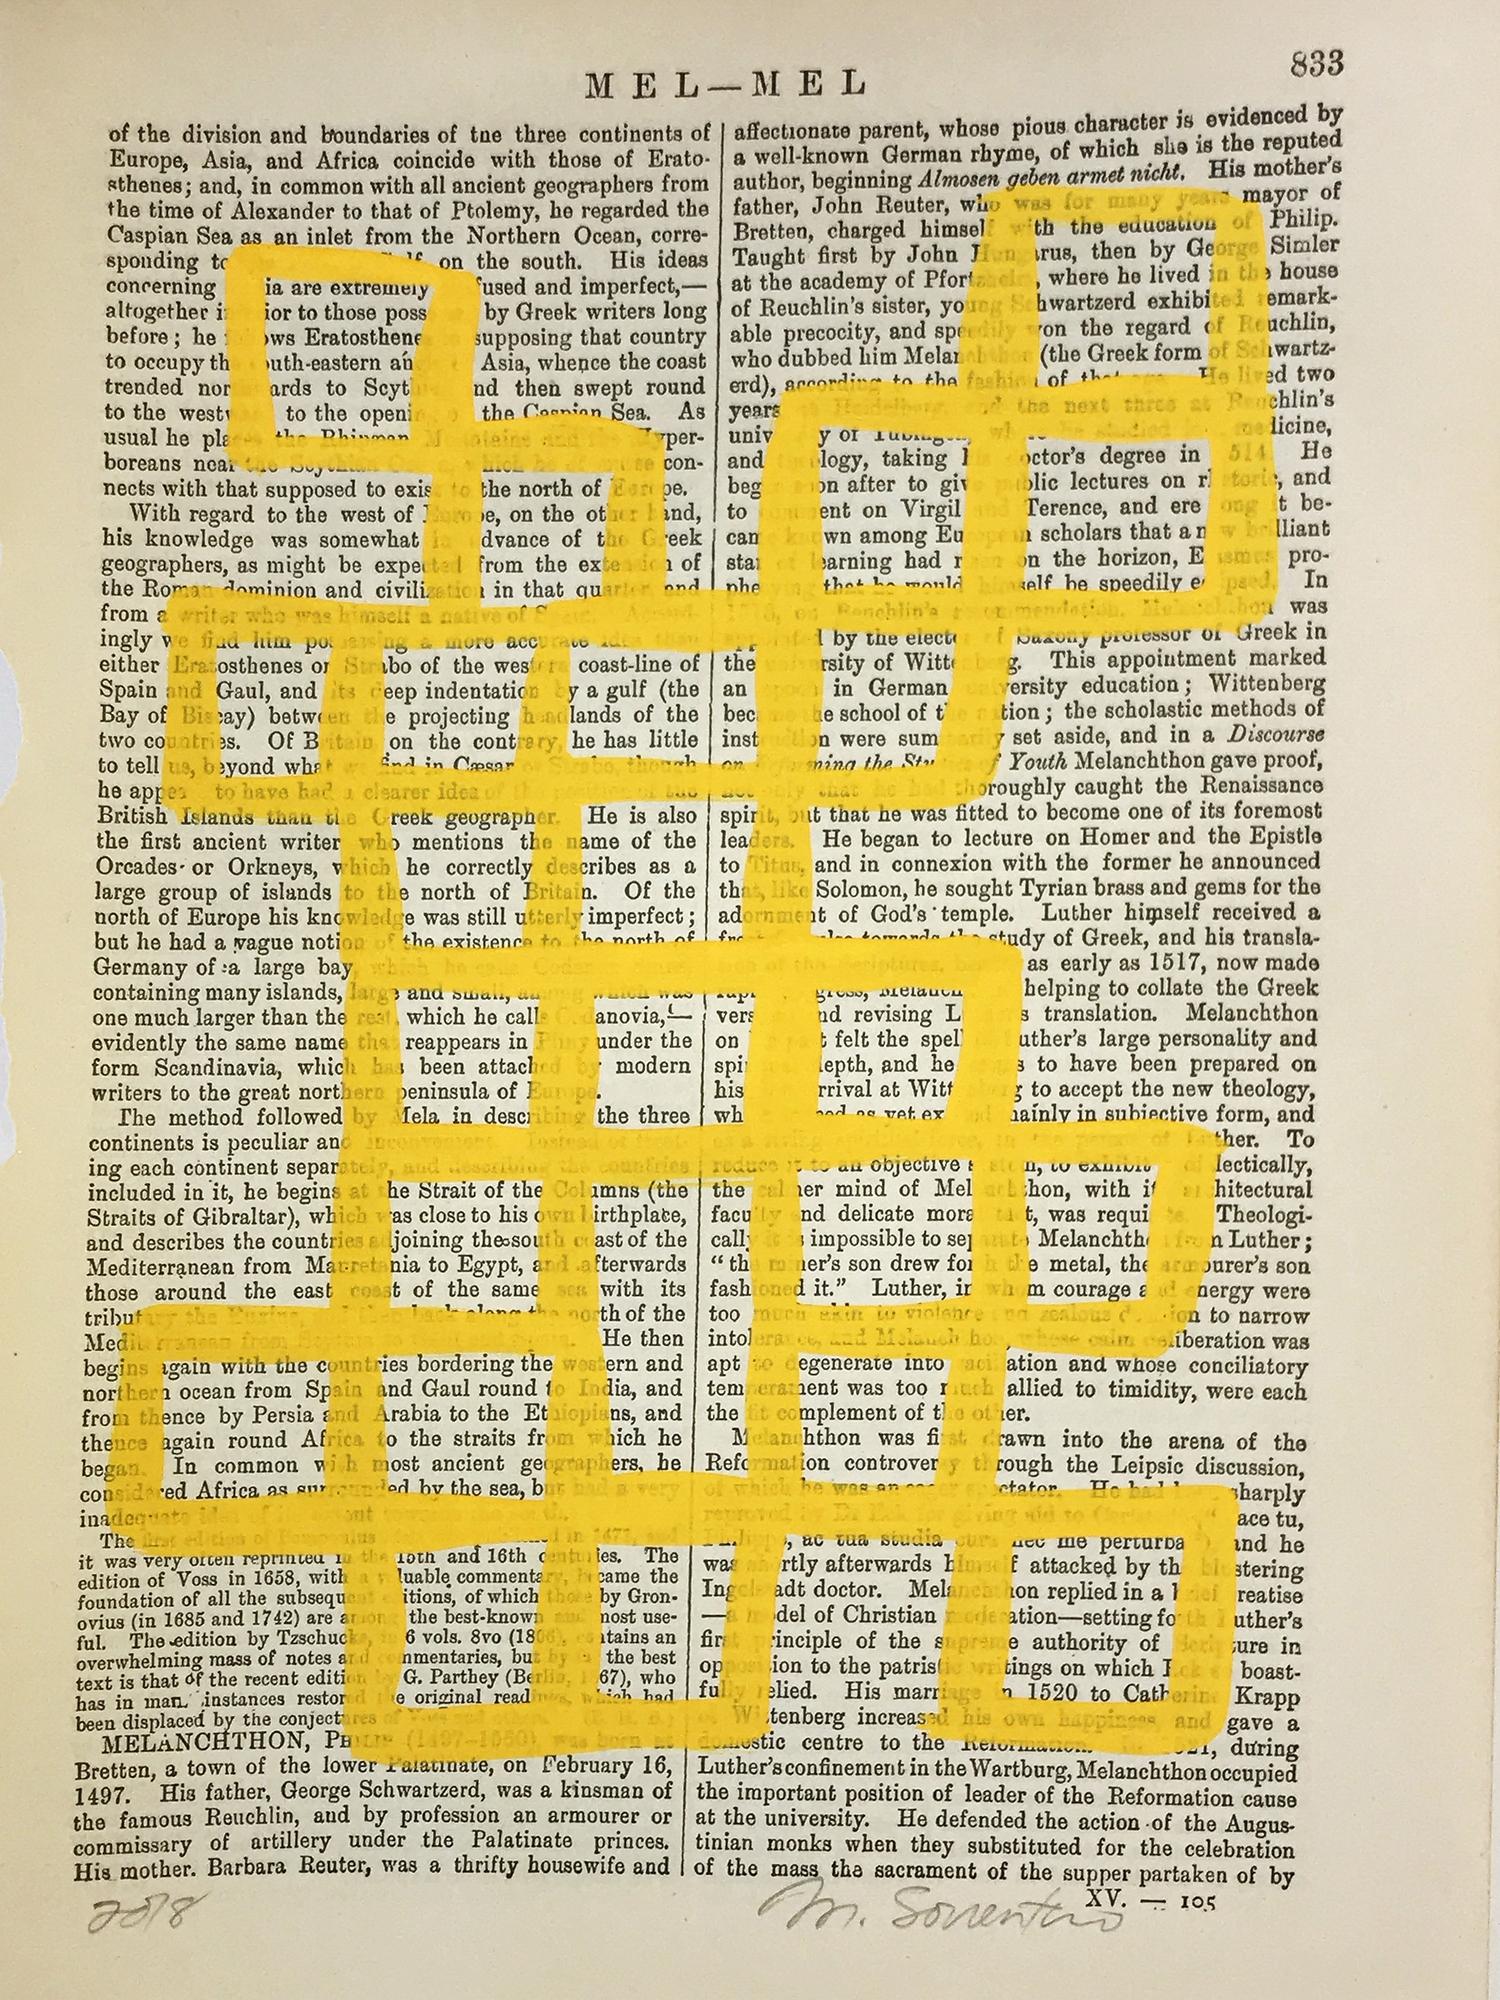 Mel-Mel Yellow 833 by Michela Sorrentino